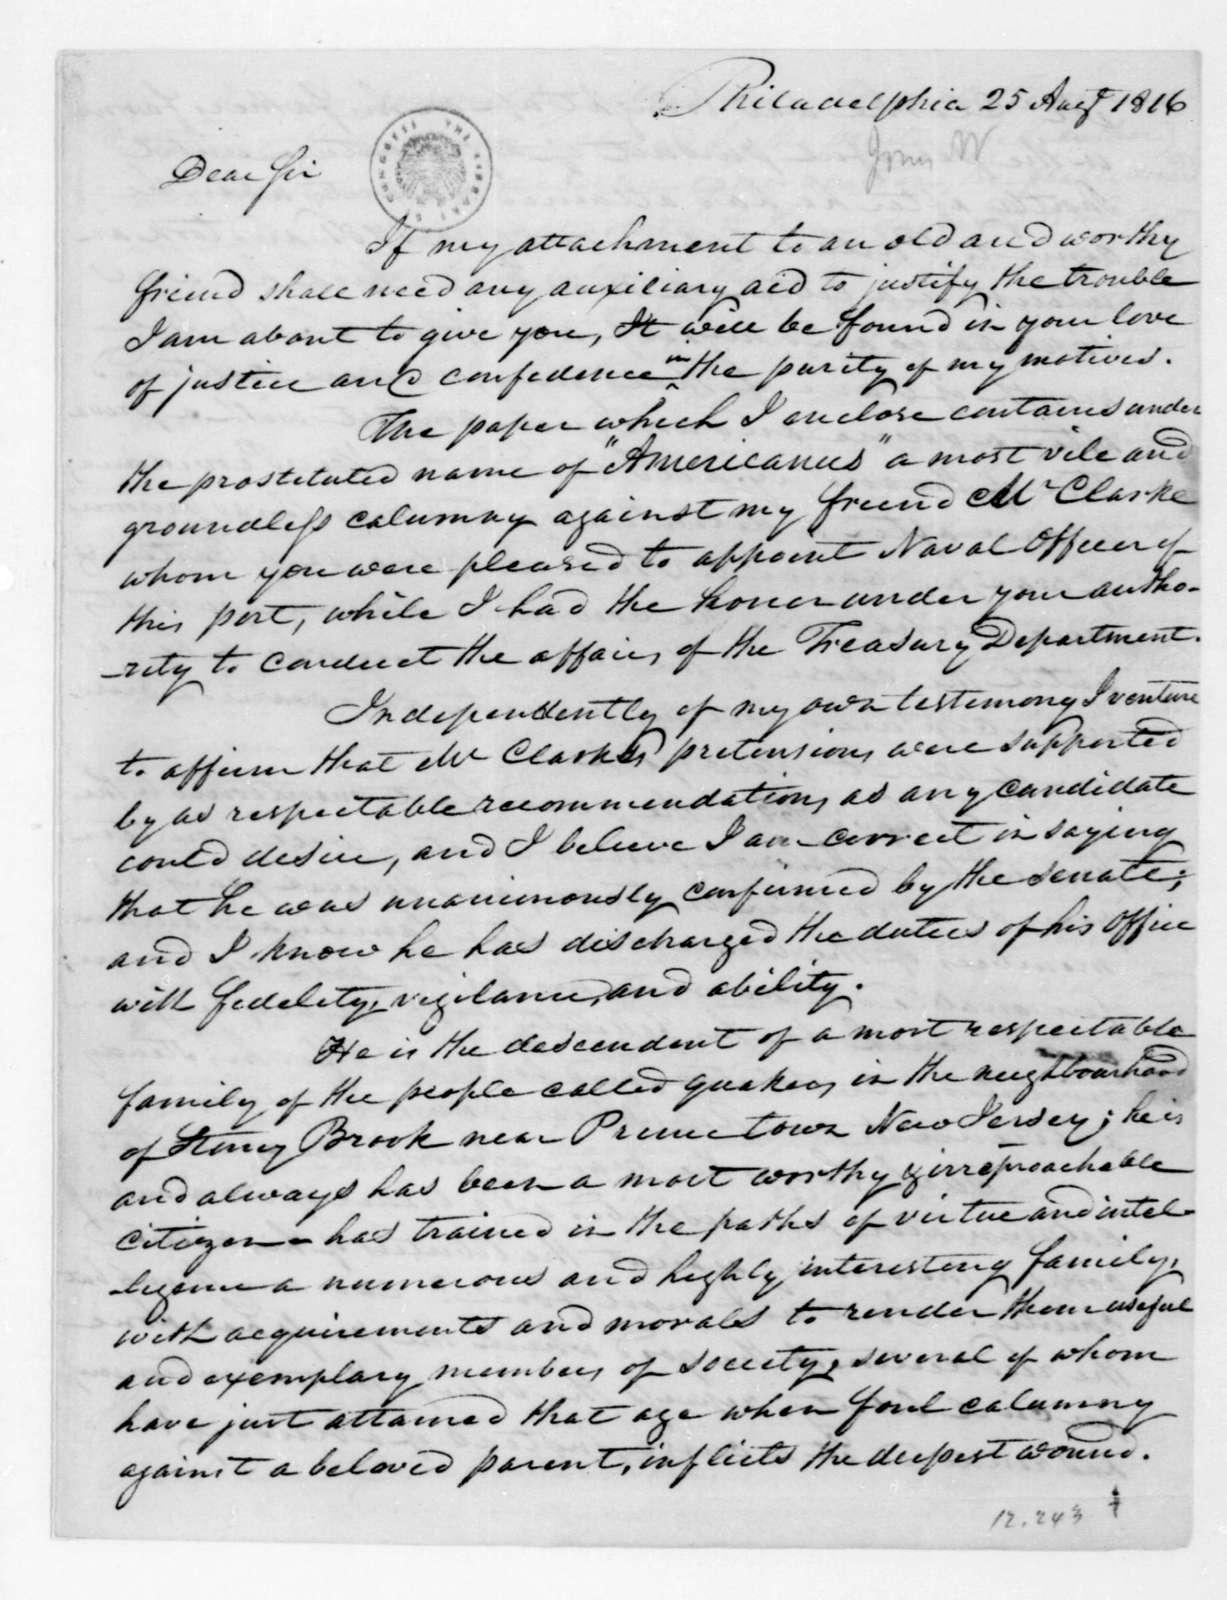 William Jones to James Madison, August 25, 1816.